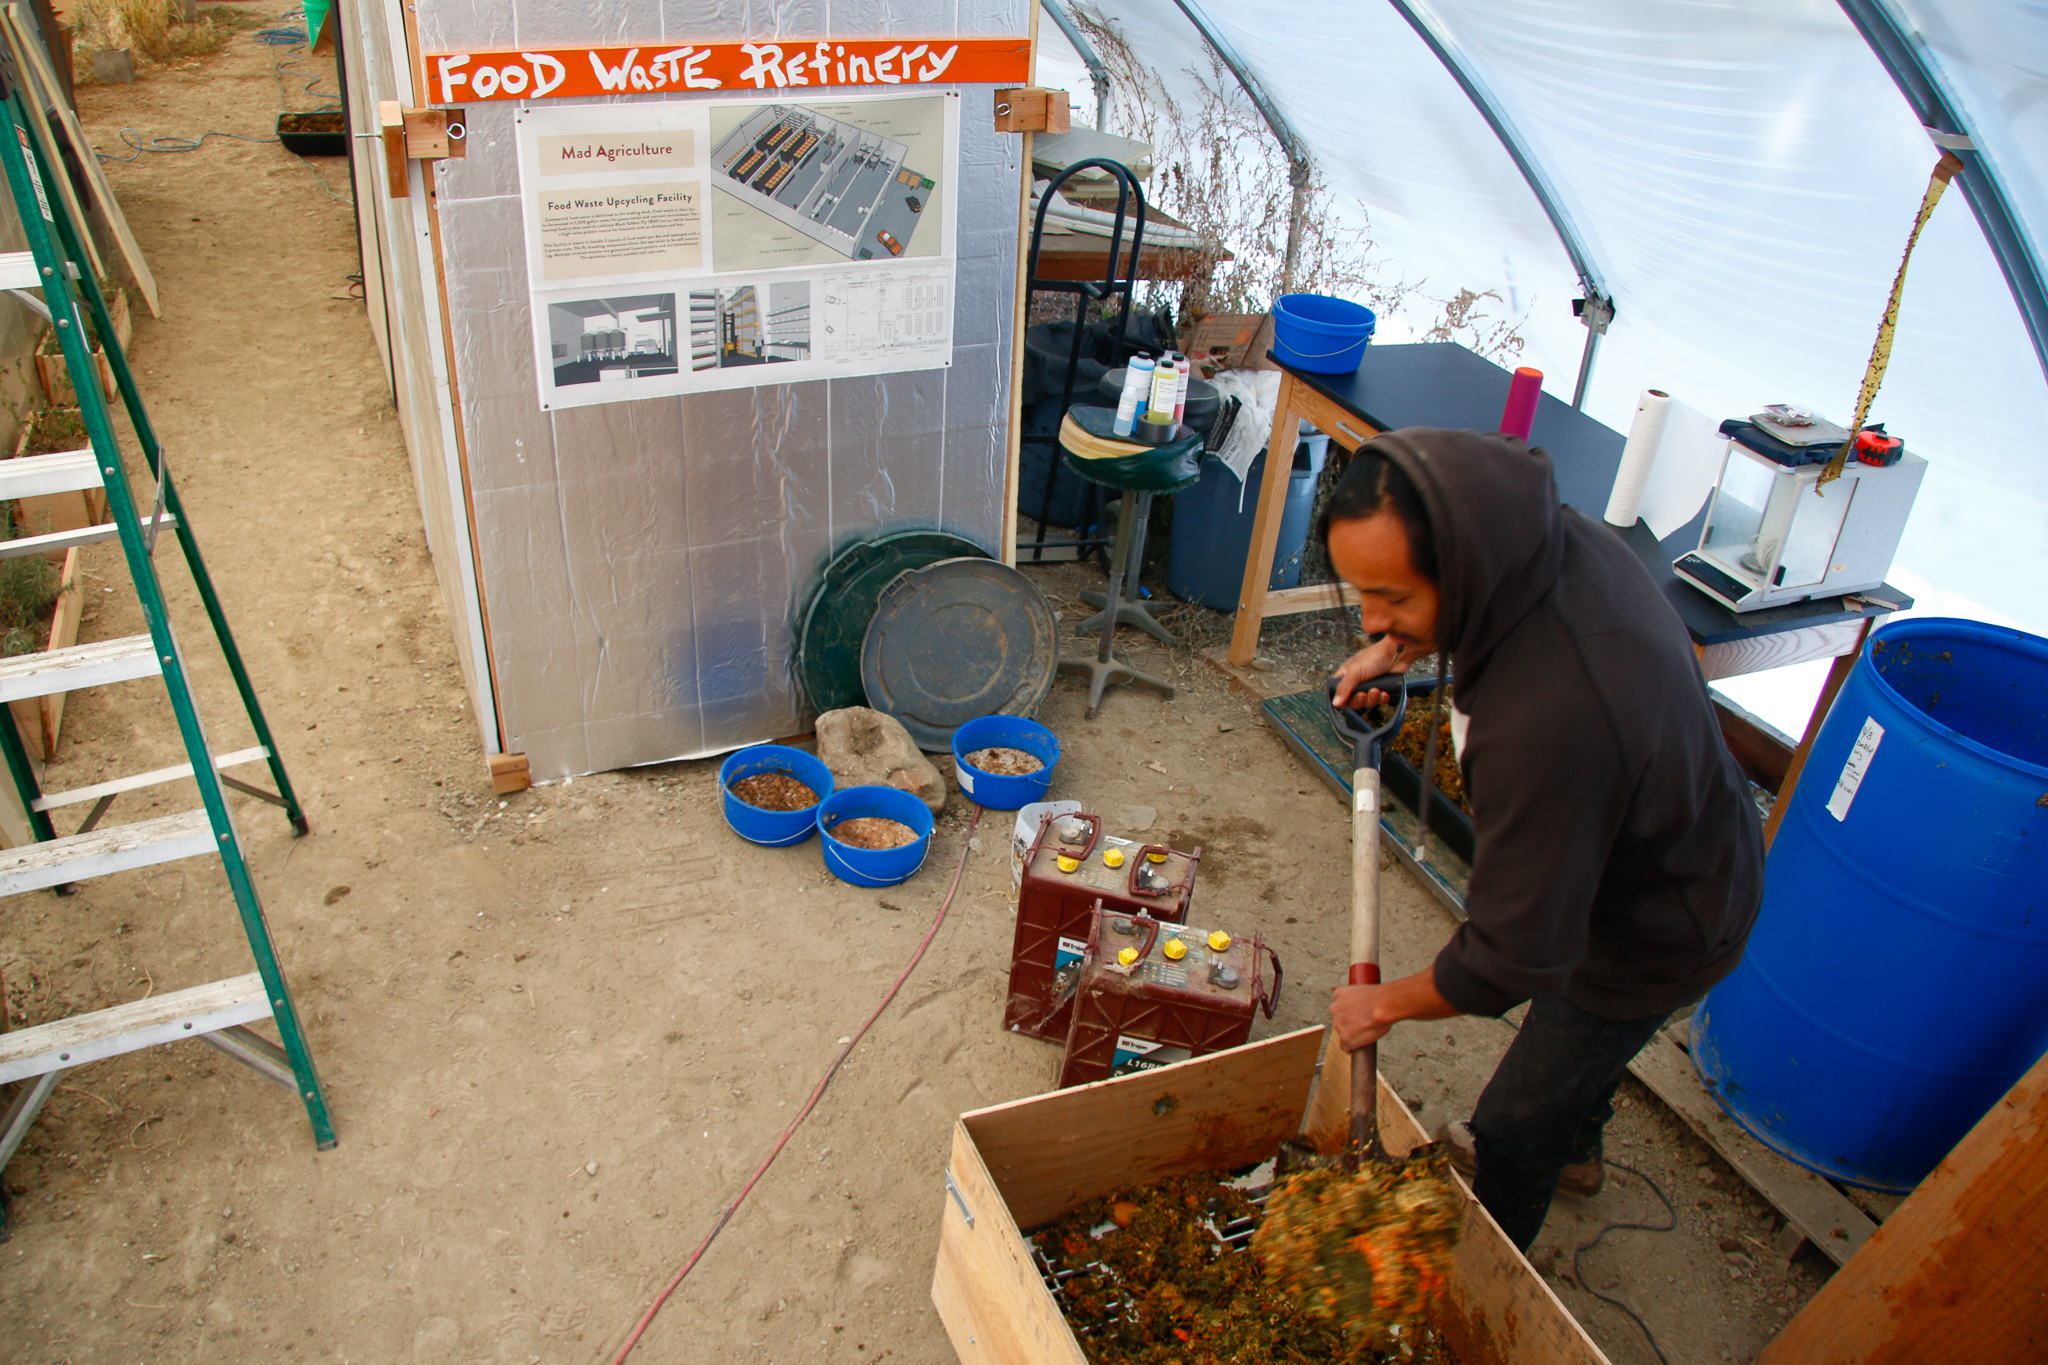 Xavier Rojas shovels fresh food waste from Wonder Press into fermentation barrels.